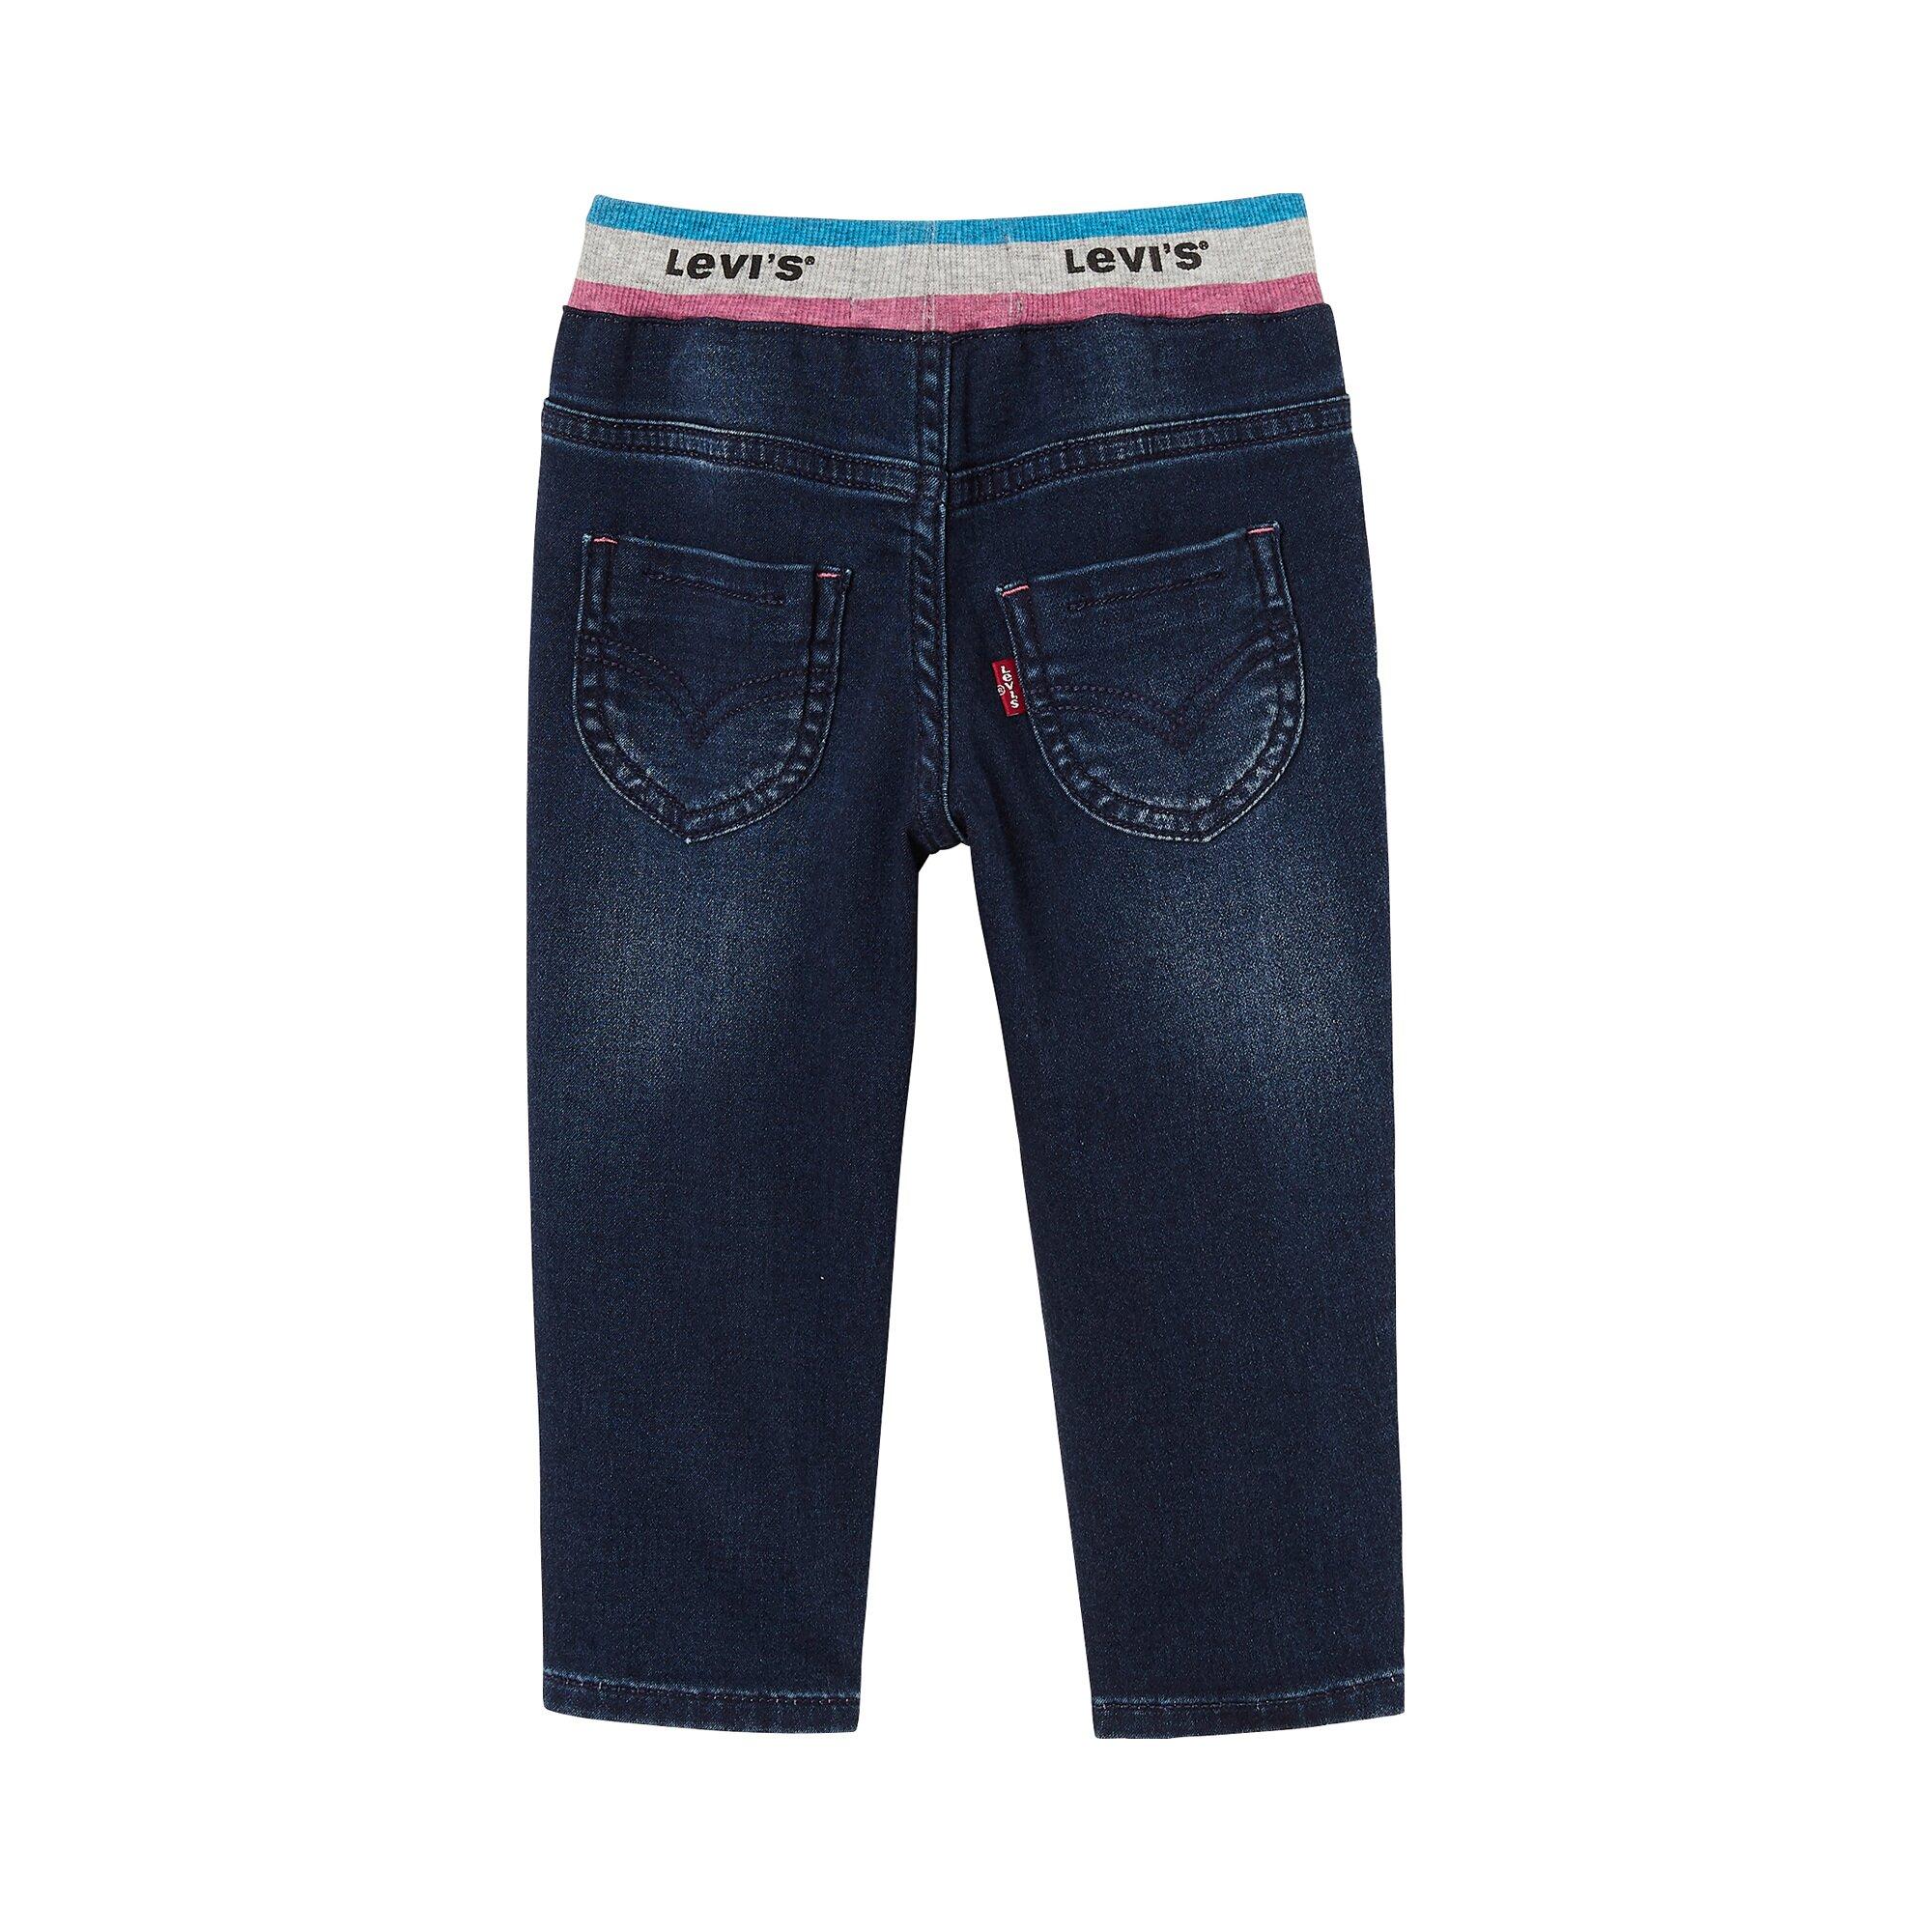 levi-s-kids-jeans-5-pocket-logobund